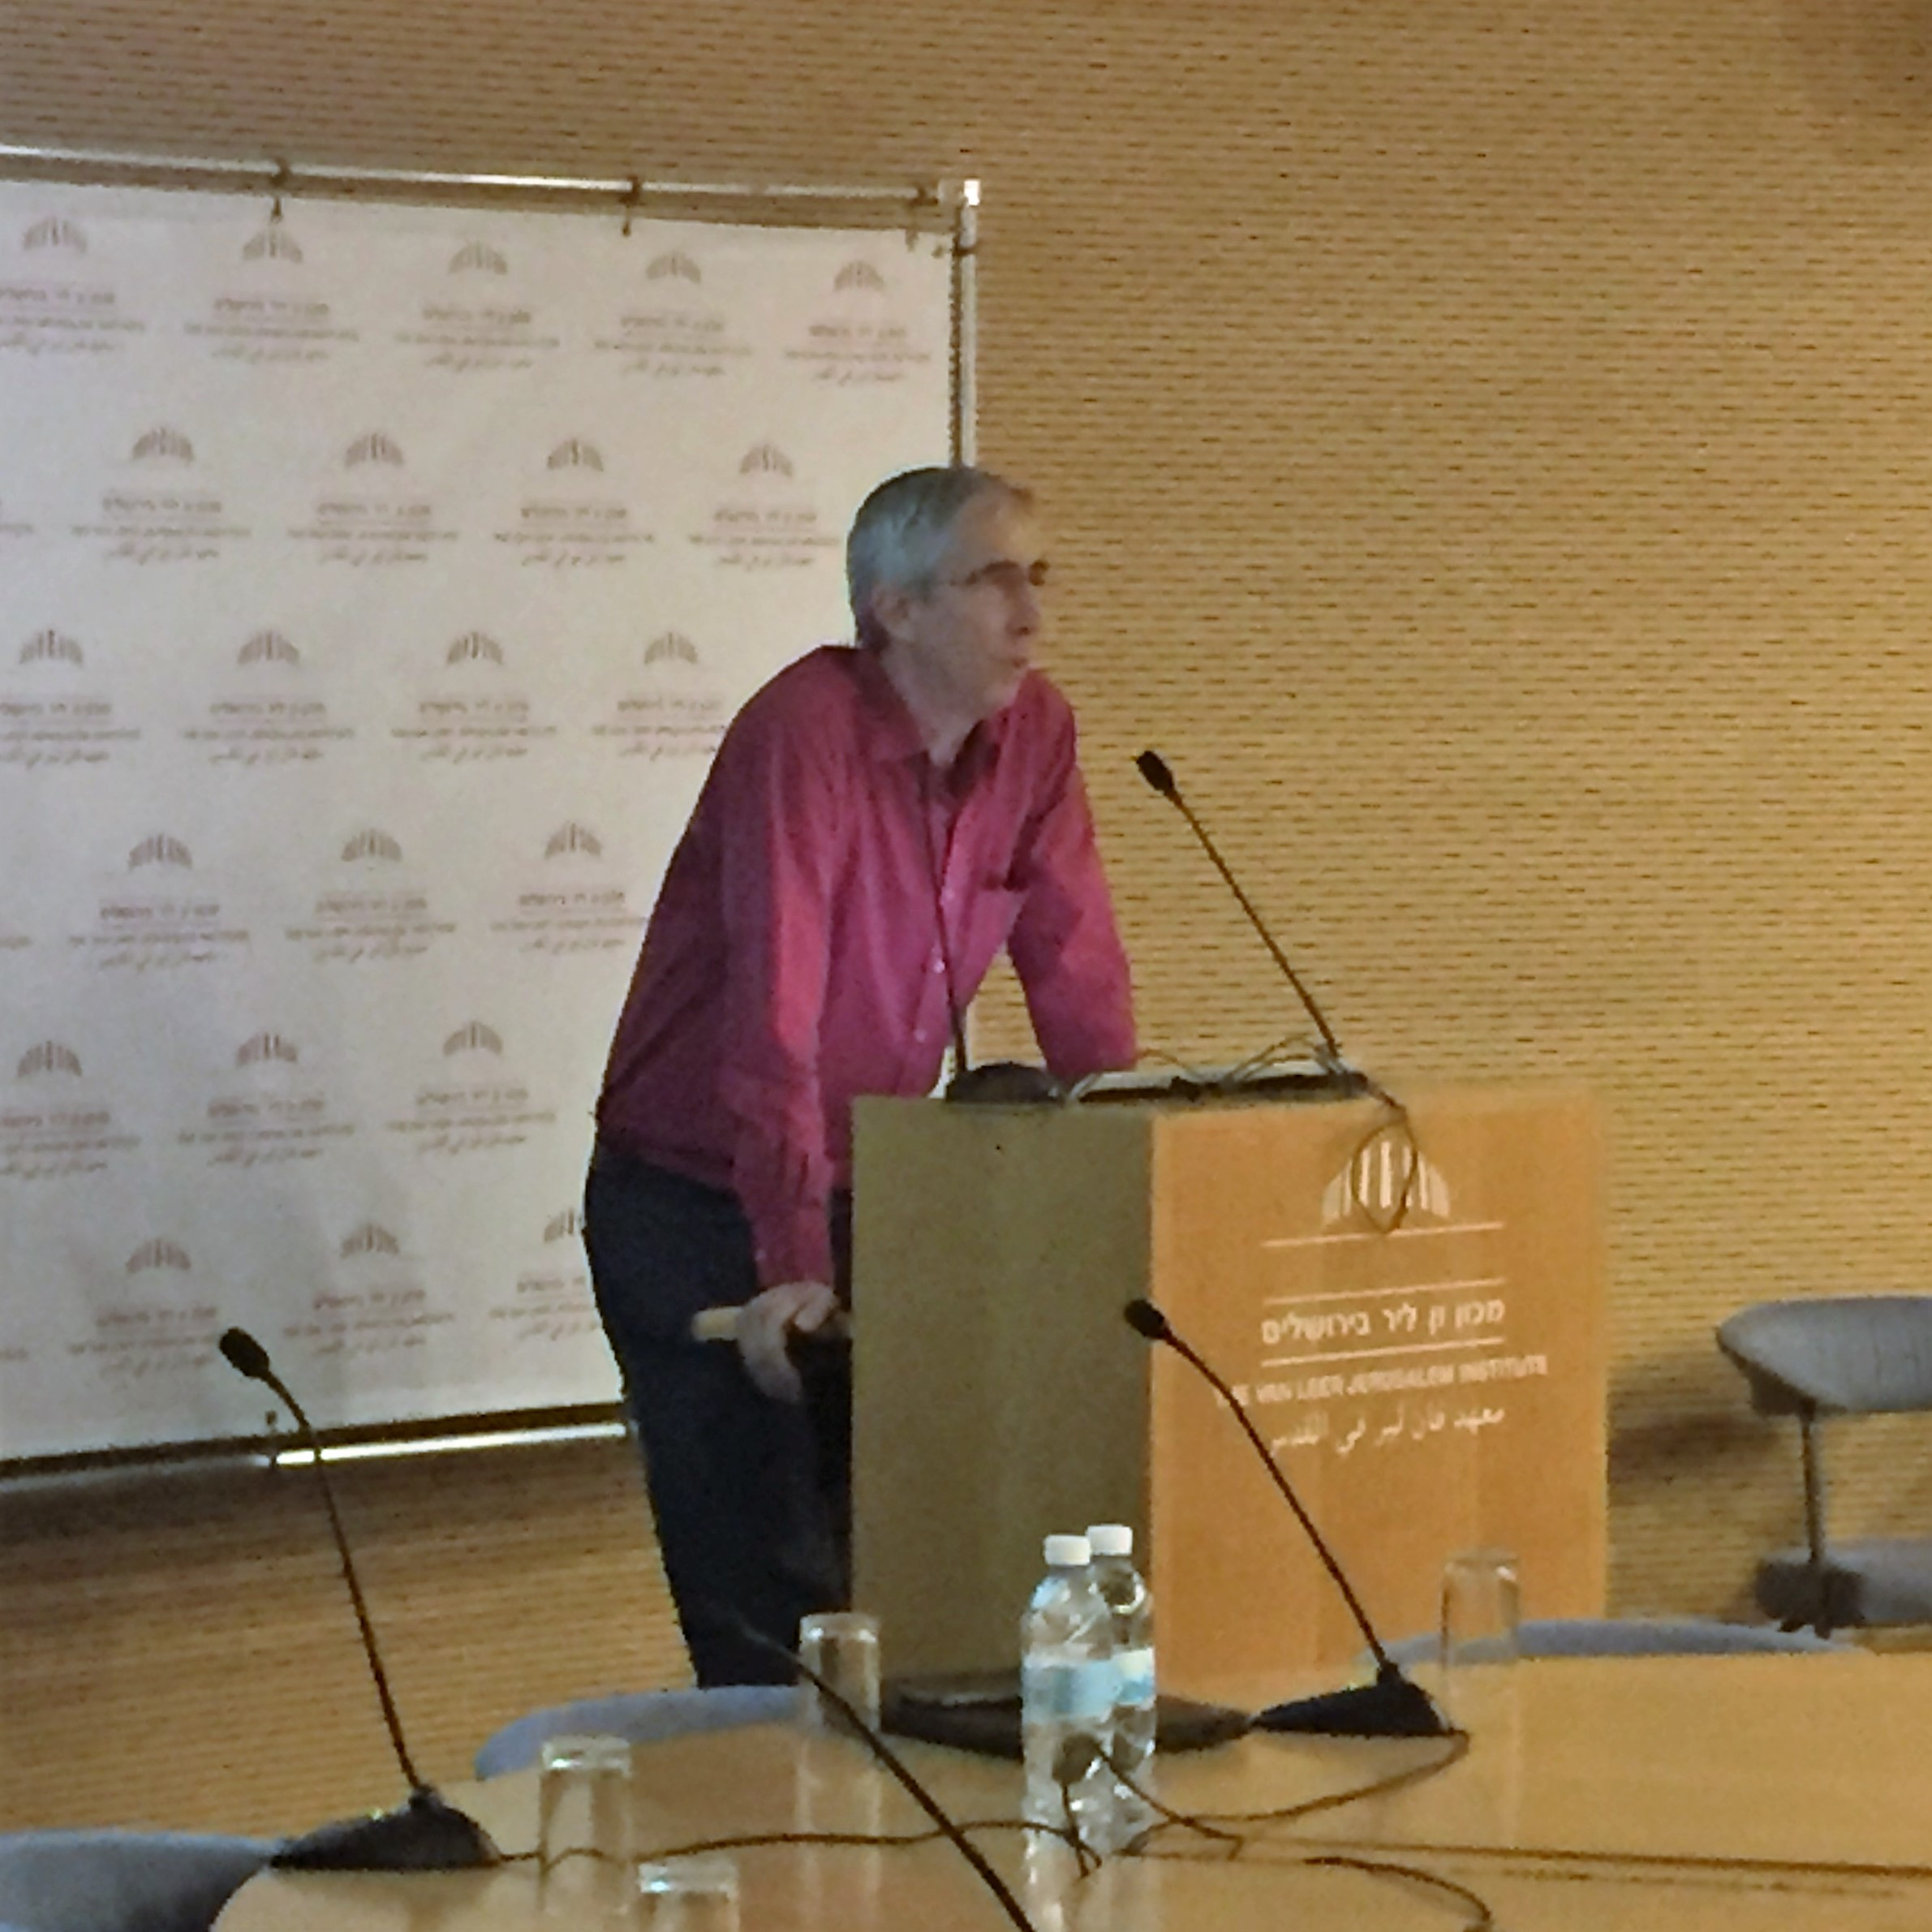 EVA – Minerva 2016 Conference by Mel Rosenberg - מל רוזנברג - Ourboox.com